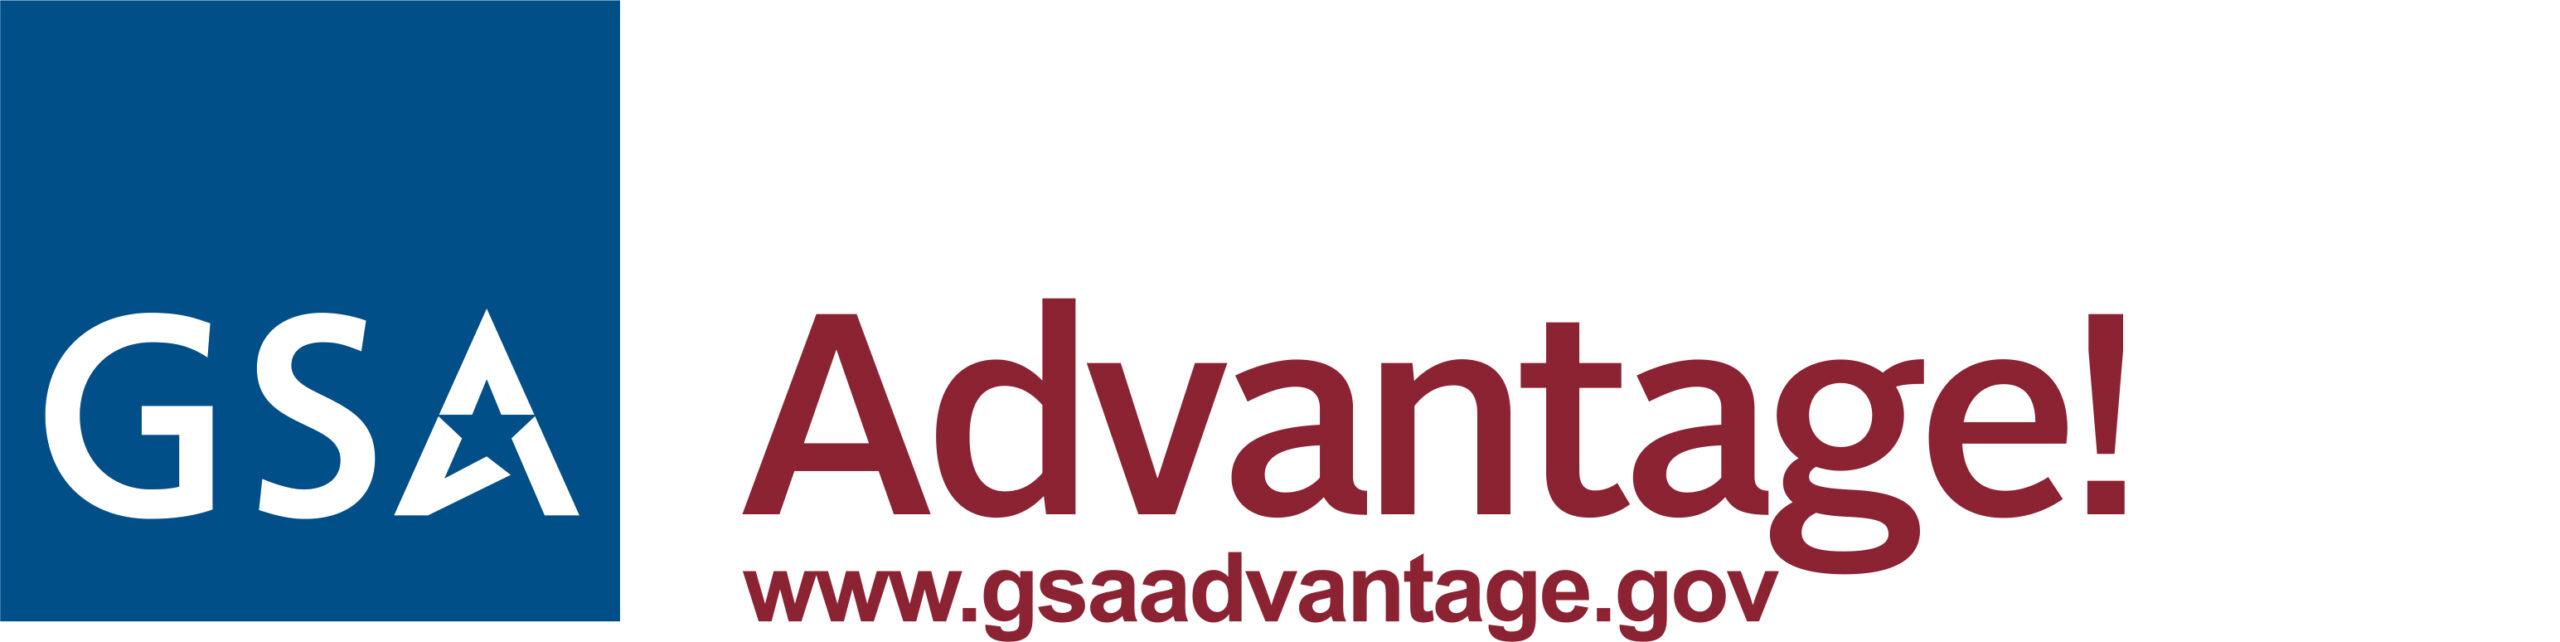 GSA Advantage_Color_and_webaddress_2020